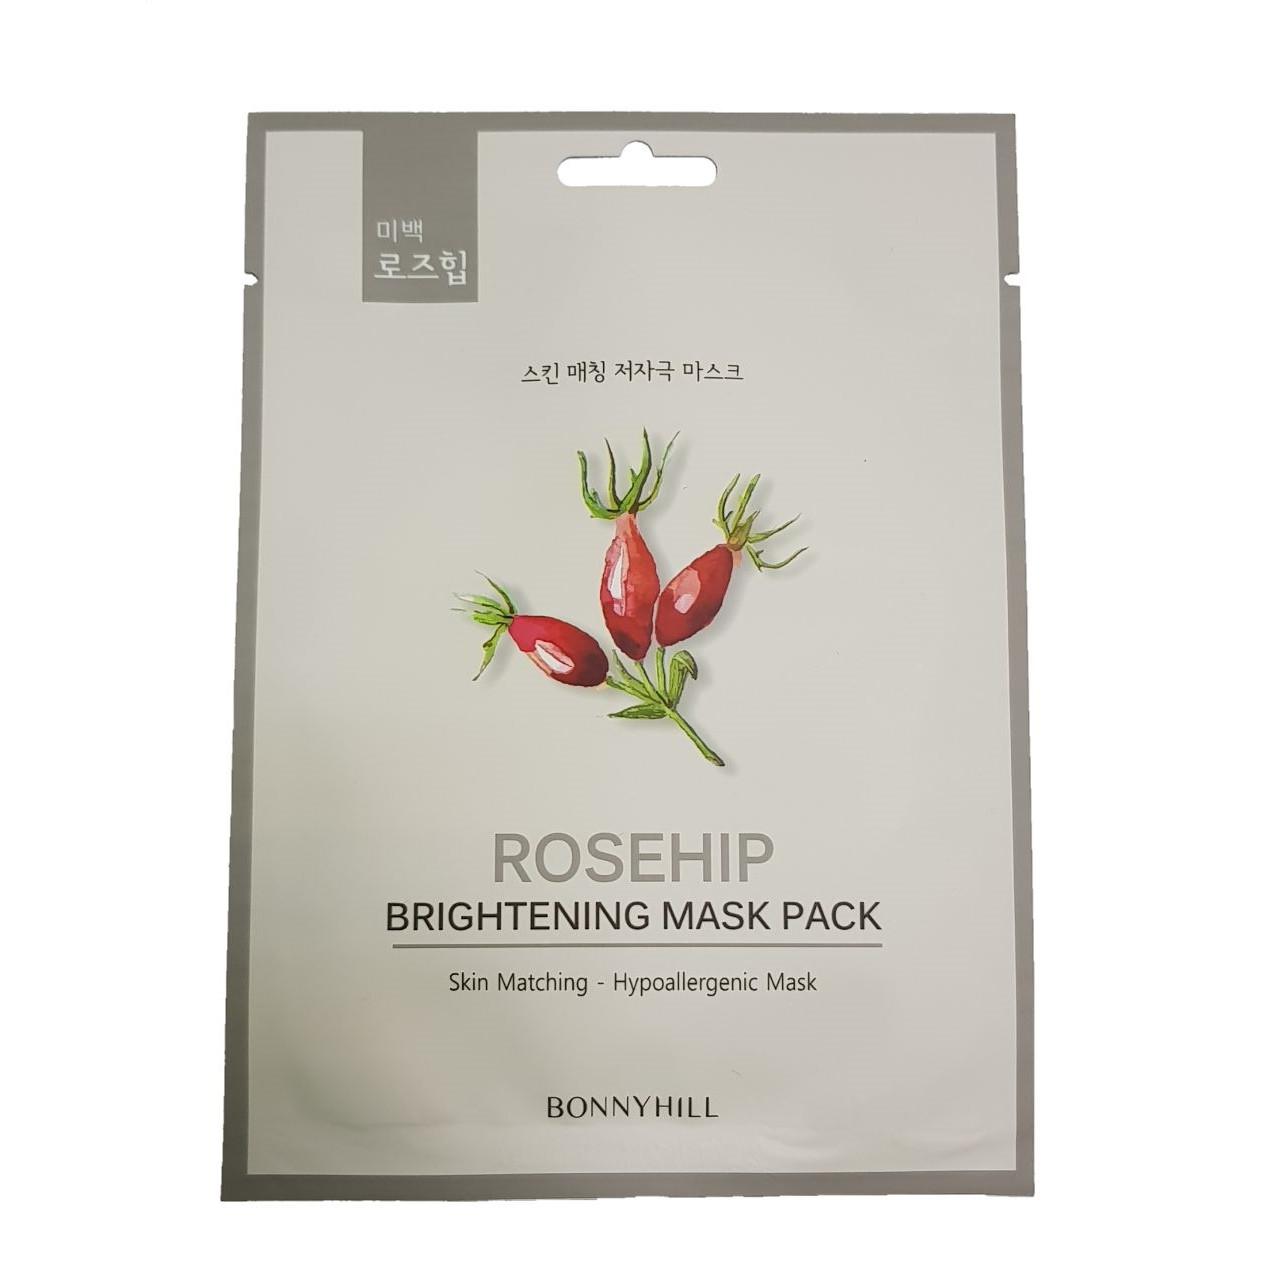 Тканевая маска для лица с экстрактом шиповника Bonnyhill Mask Pack Rosehip 23 г (8809087931380)